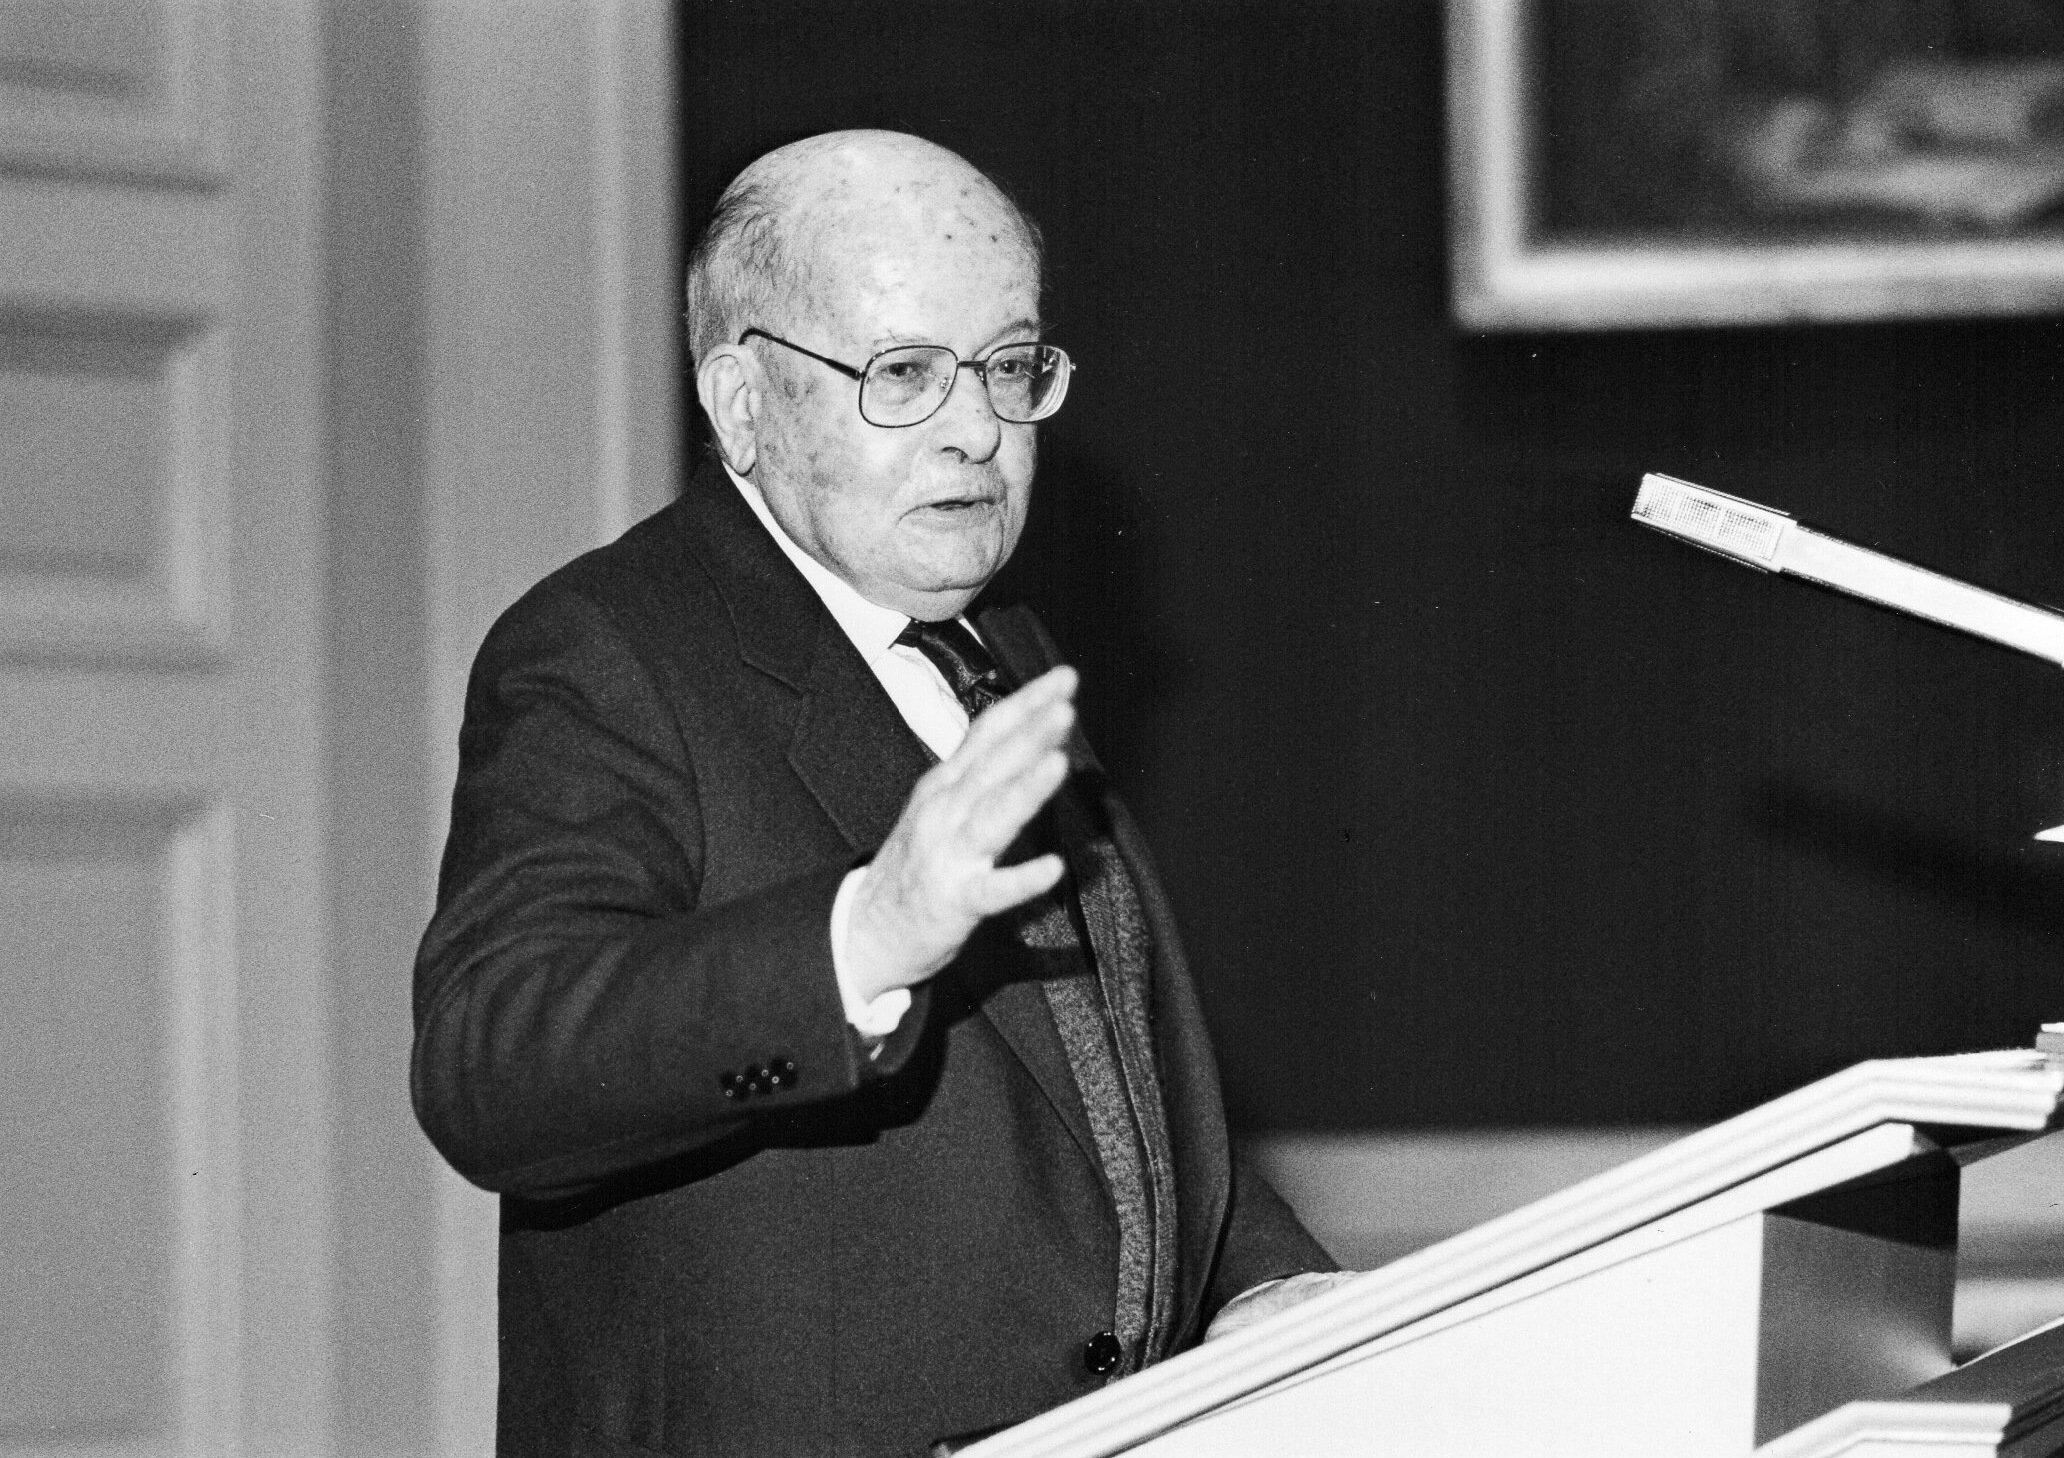 Georgs Gusdorf